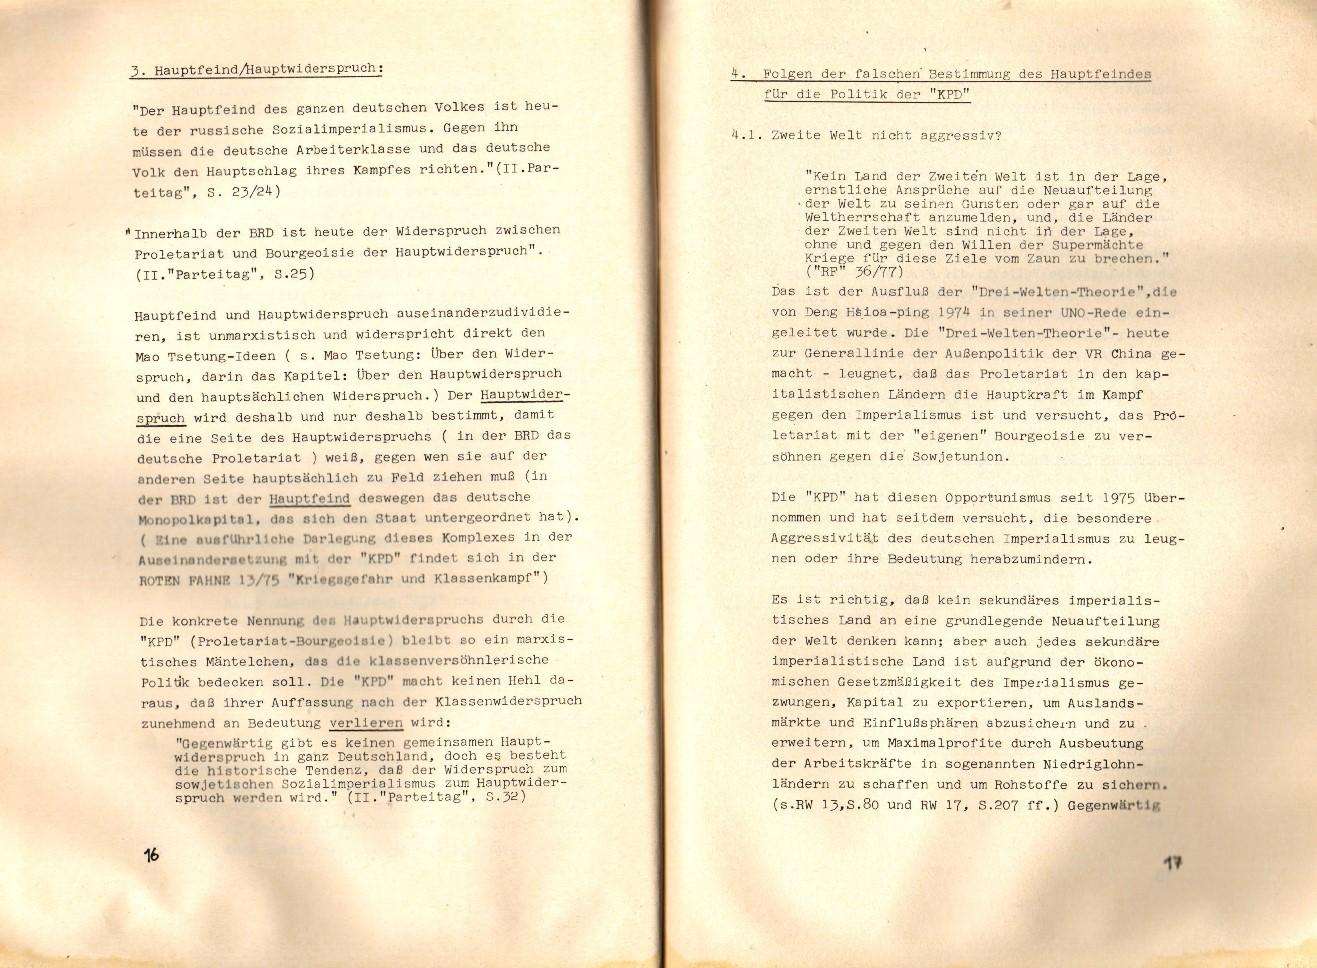 KABD_1978_Argumentationshilfen_10